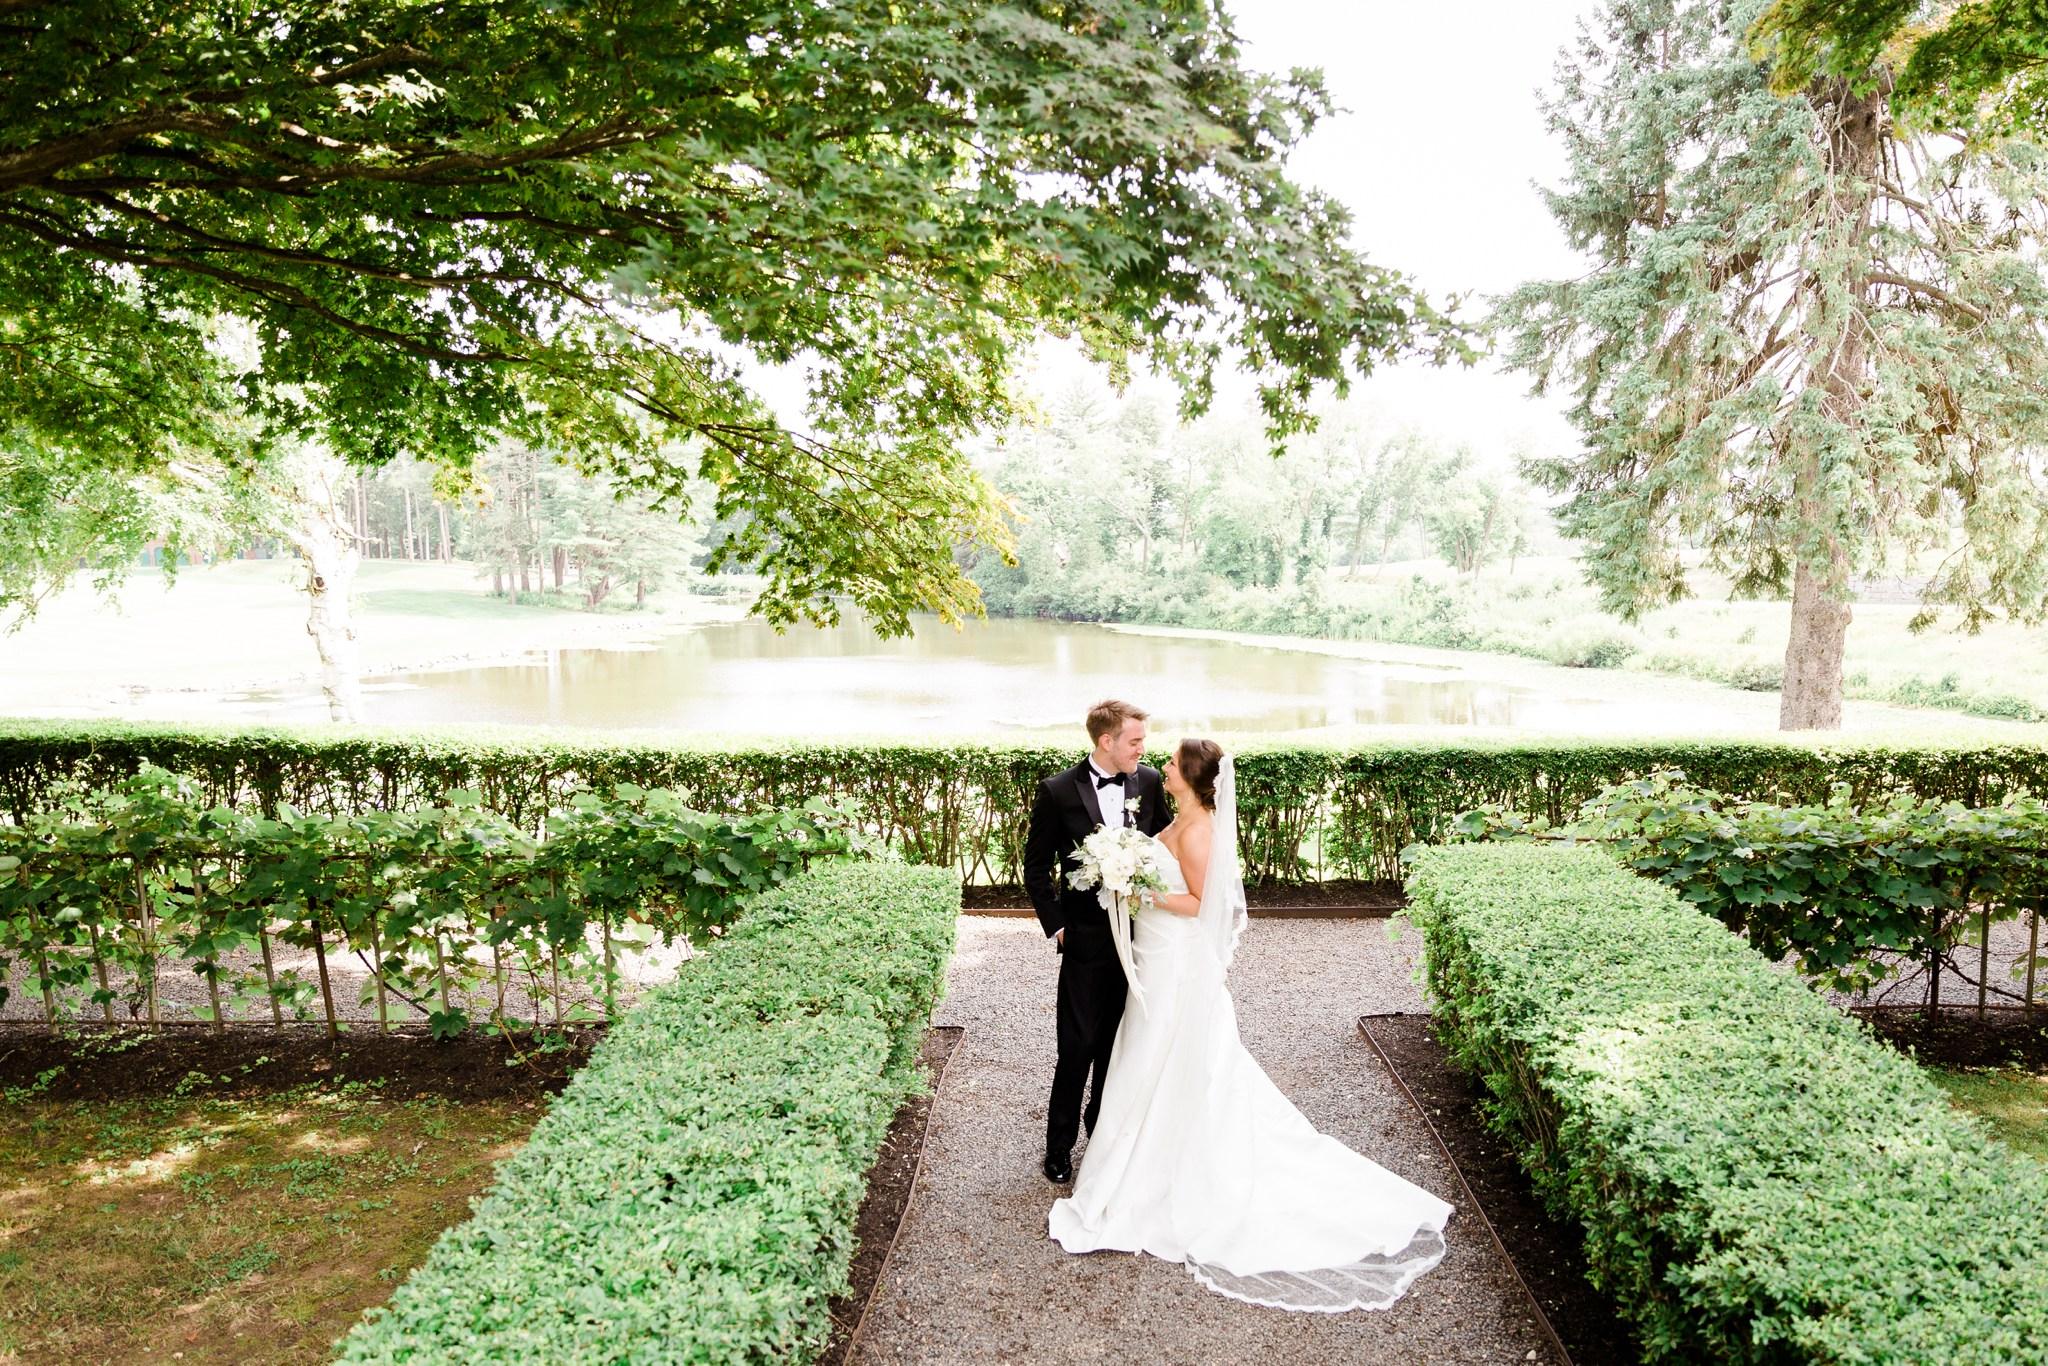 turner_hill_wedding_photos_00018.JPG